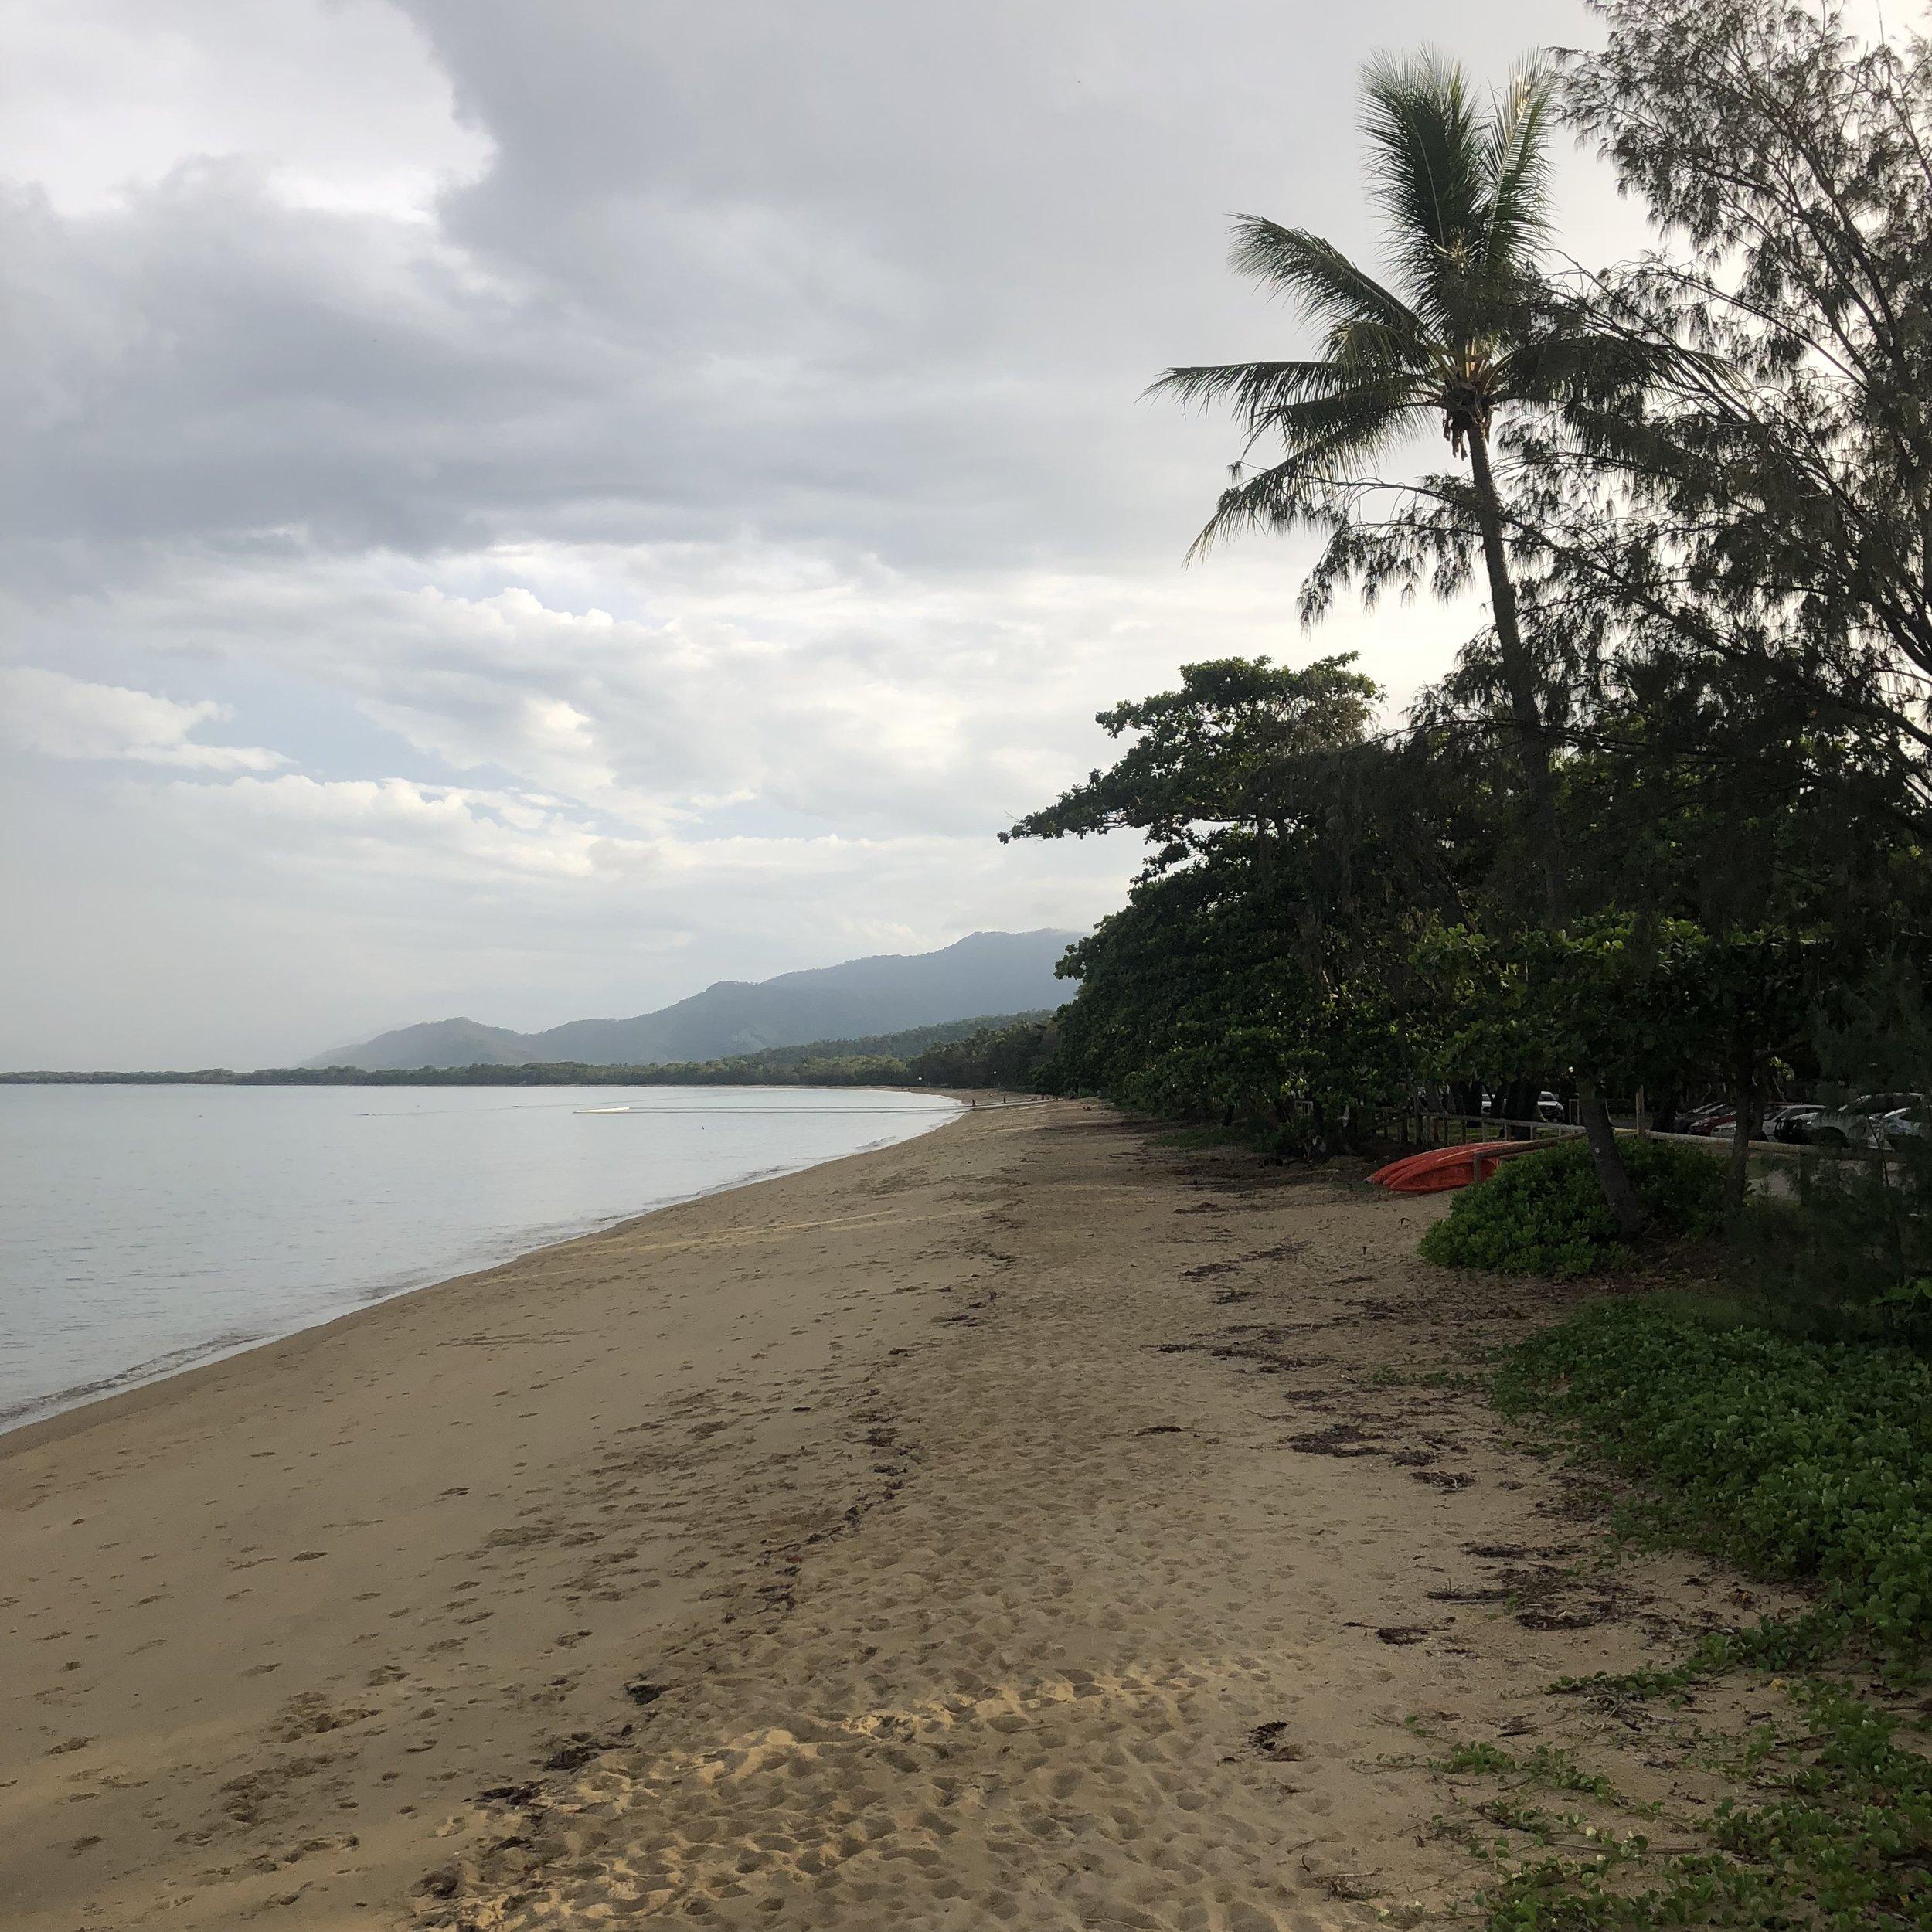 Palm trees line the shore line.